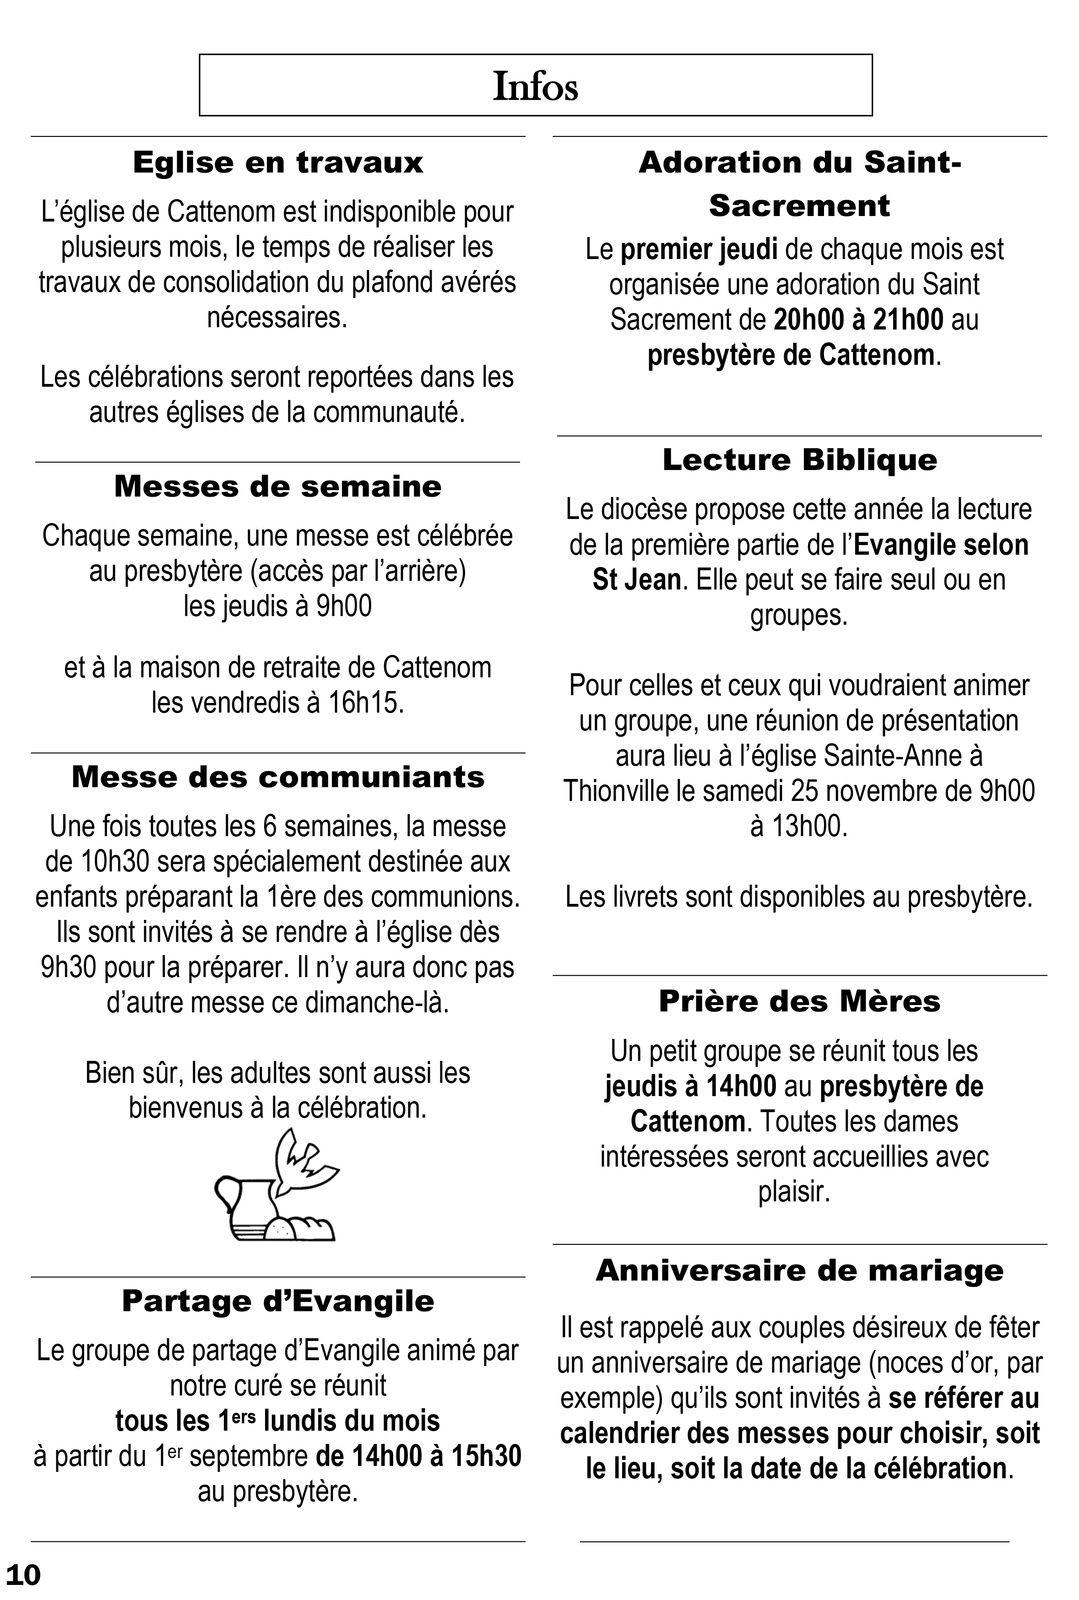 Sehr St Benoit de Cattenom - GG02